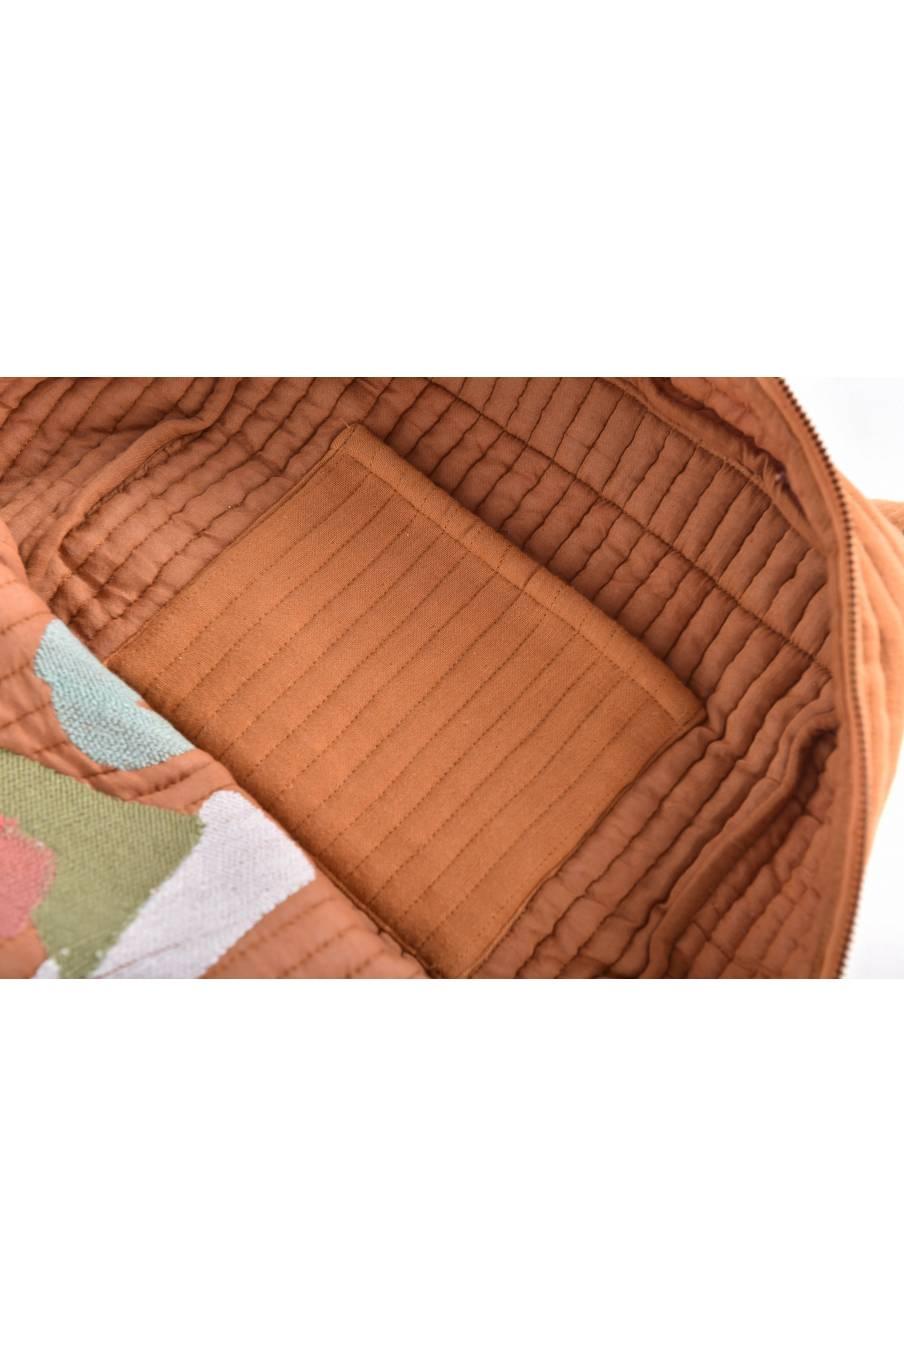 boheme chic vintage sac à dos unisex alois dark safran